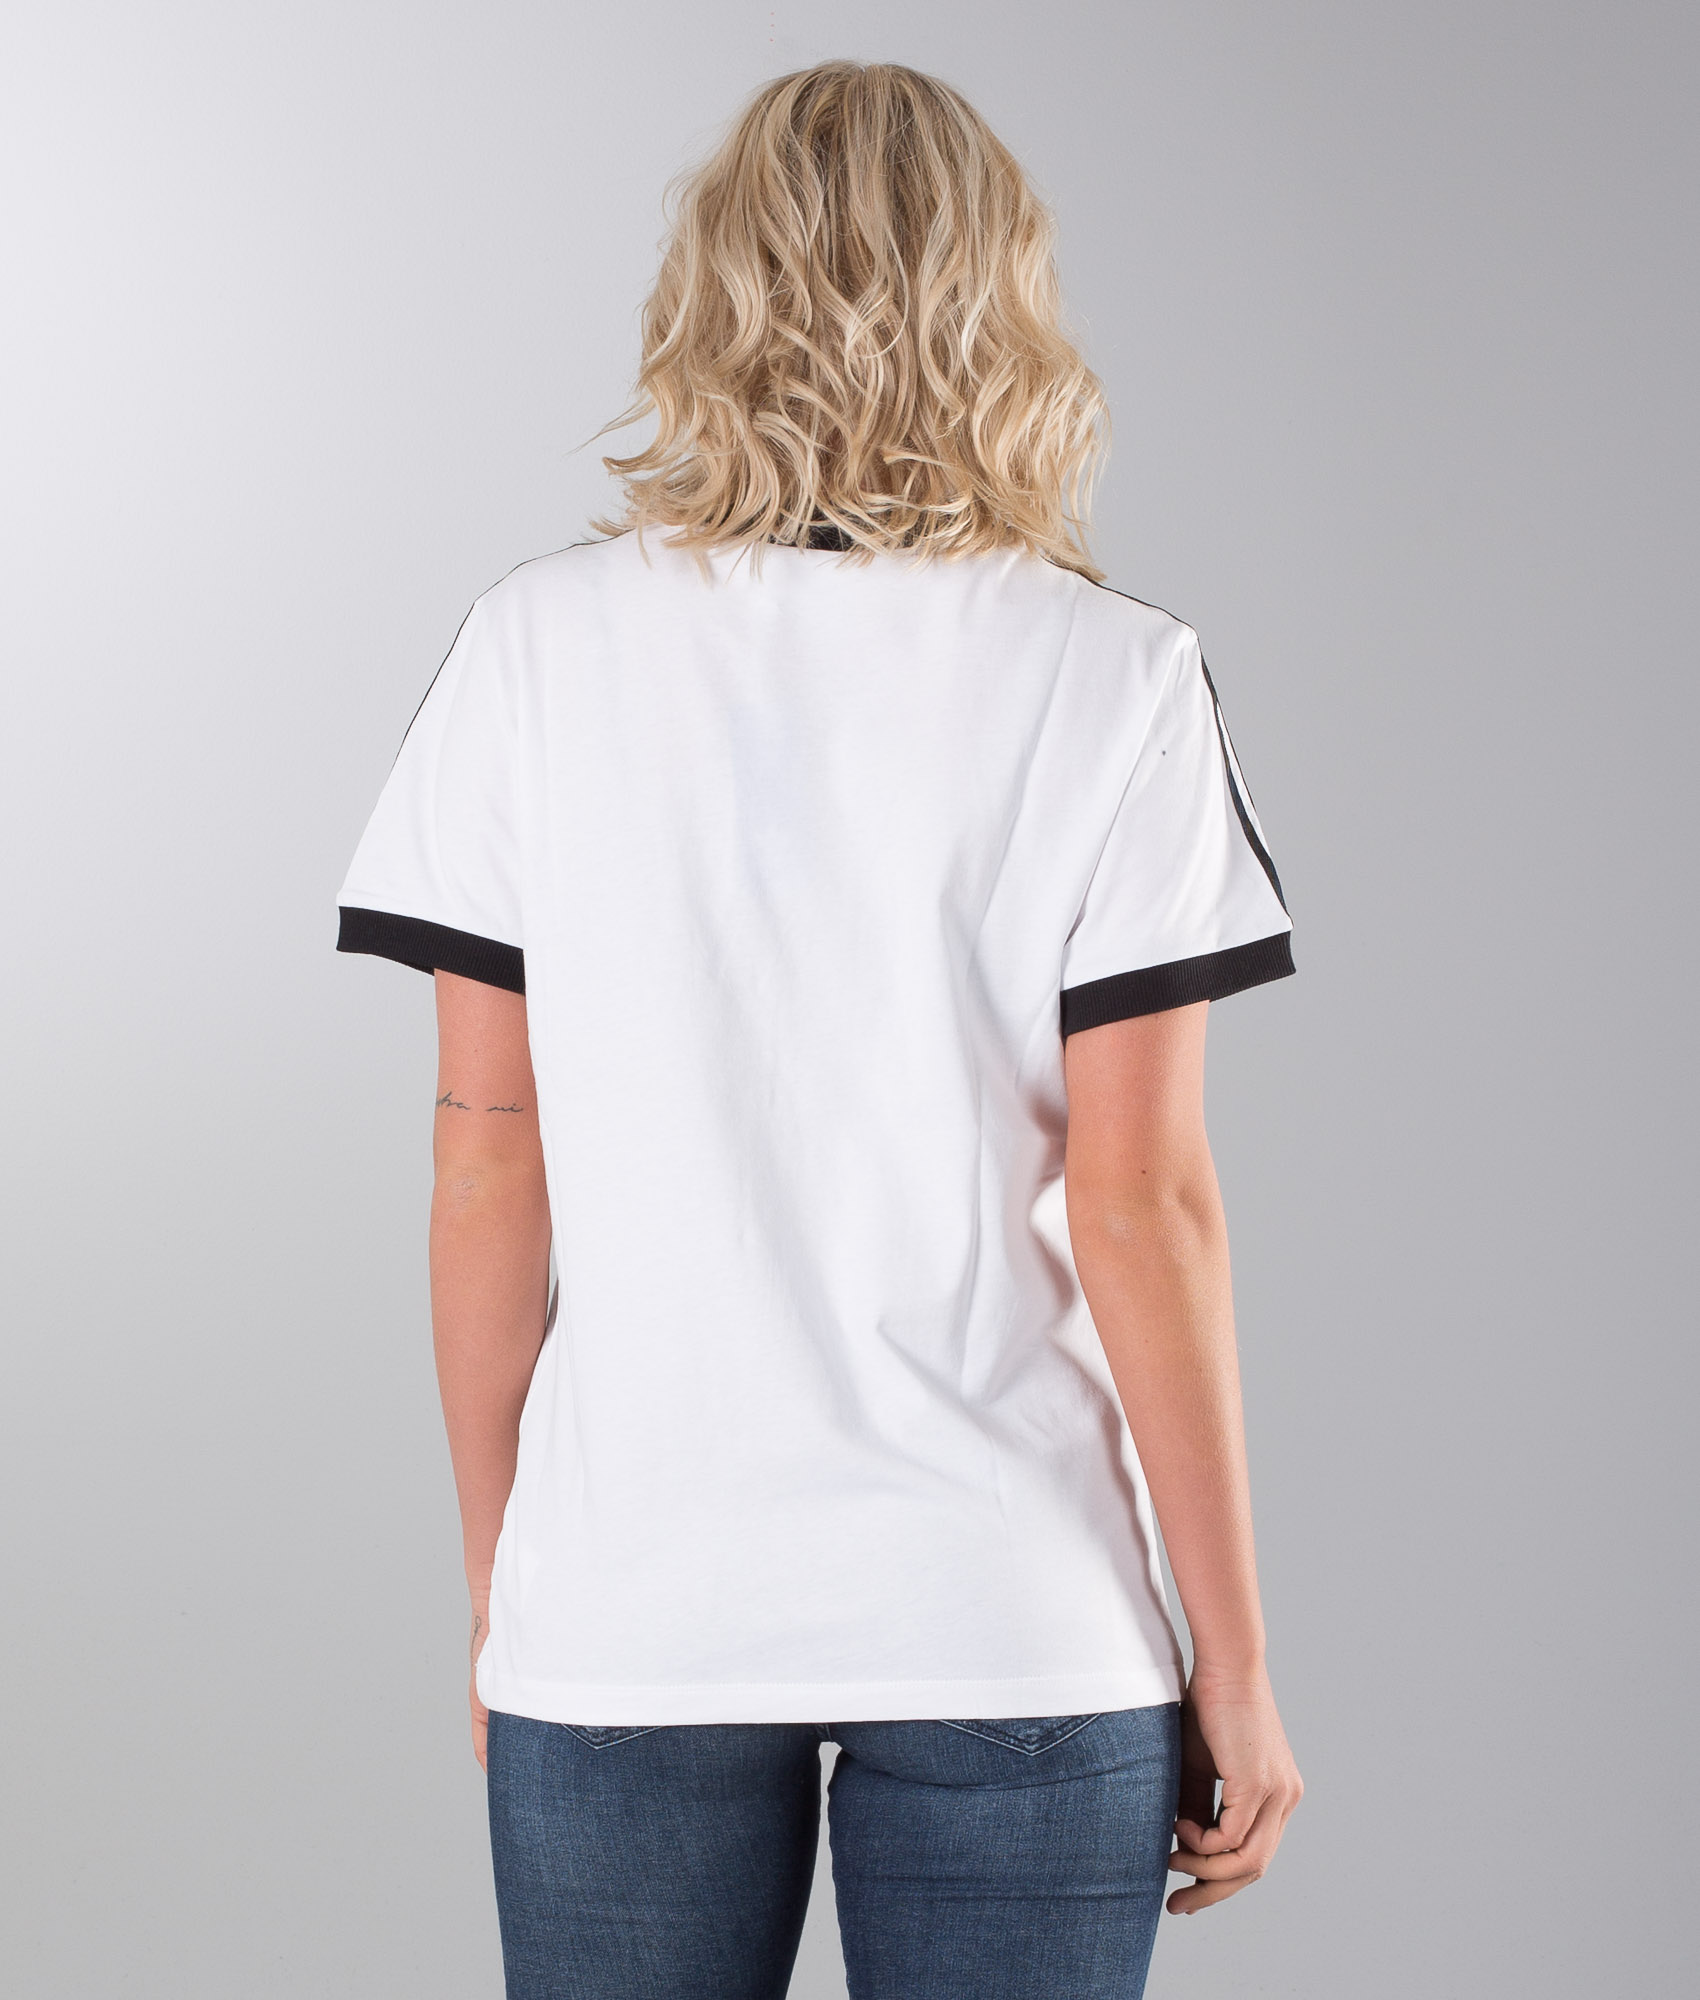 Adidas Originals 3 Stripes T Shirt WhiteBlack